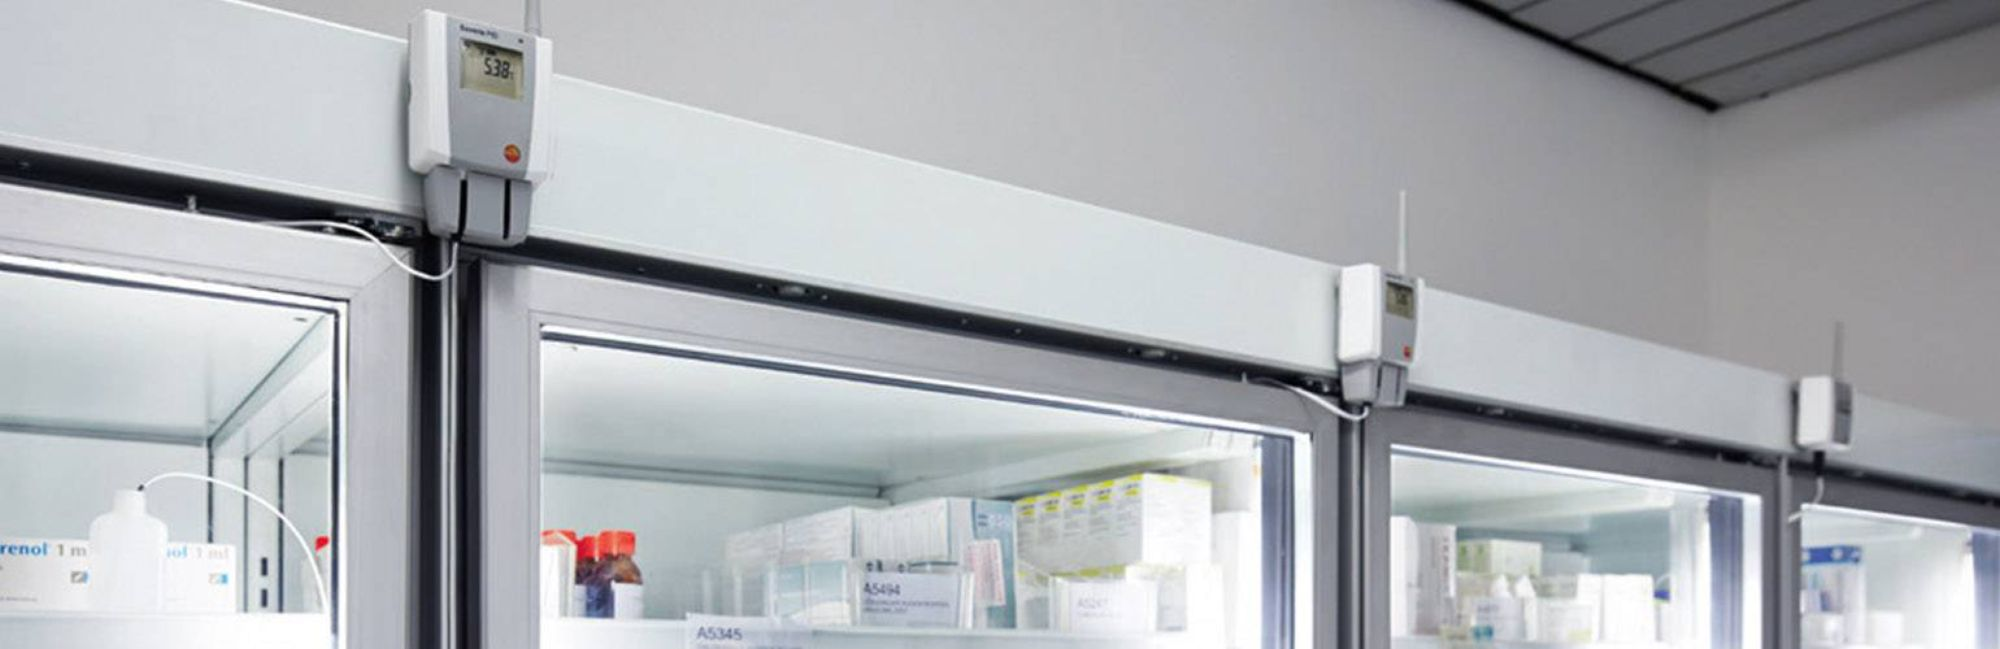 temperaturüberwachung testo saveris klinikapotheke freiburg